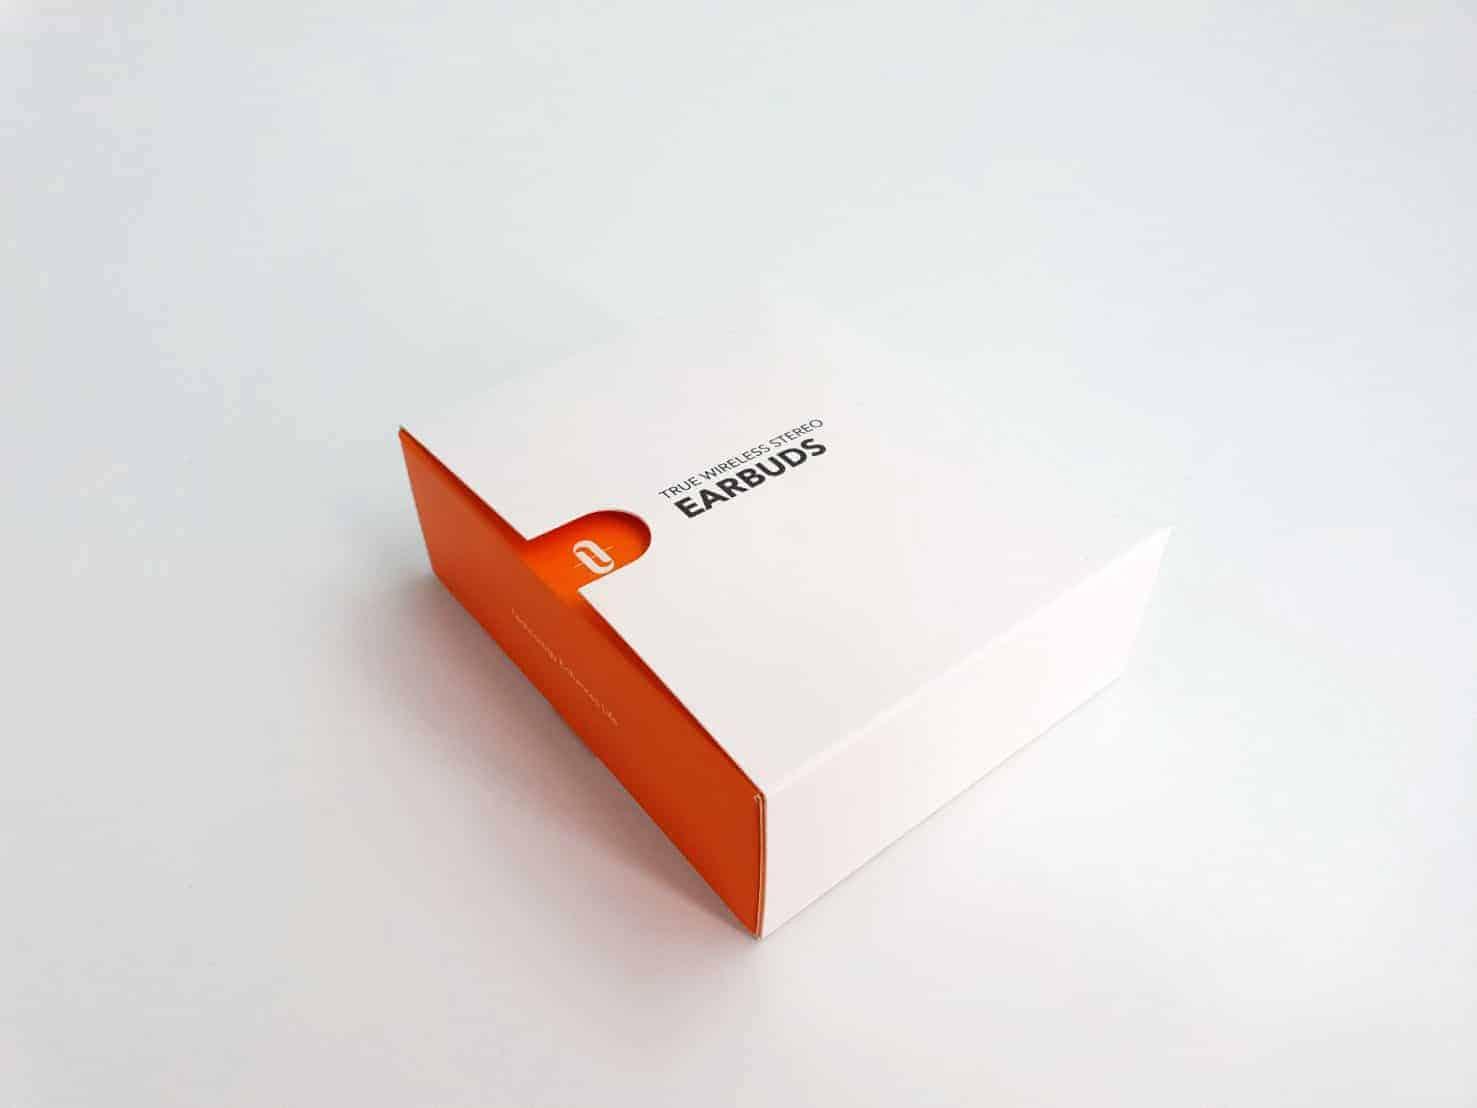 TaoTroncis TT-BH053真無線藍牙耳機推薦 外盒